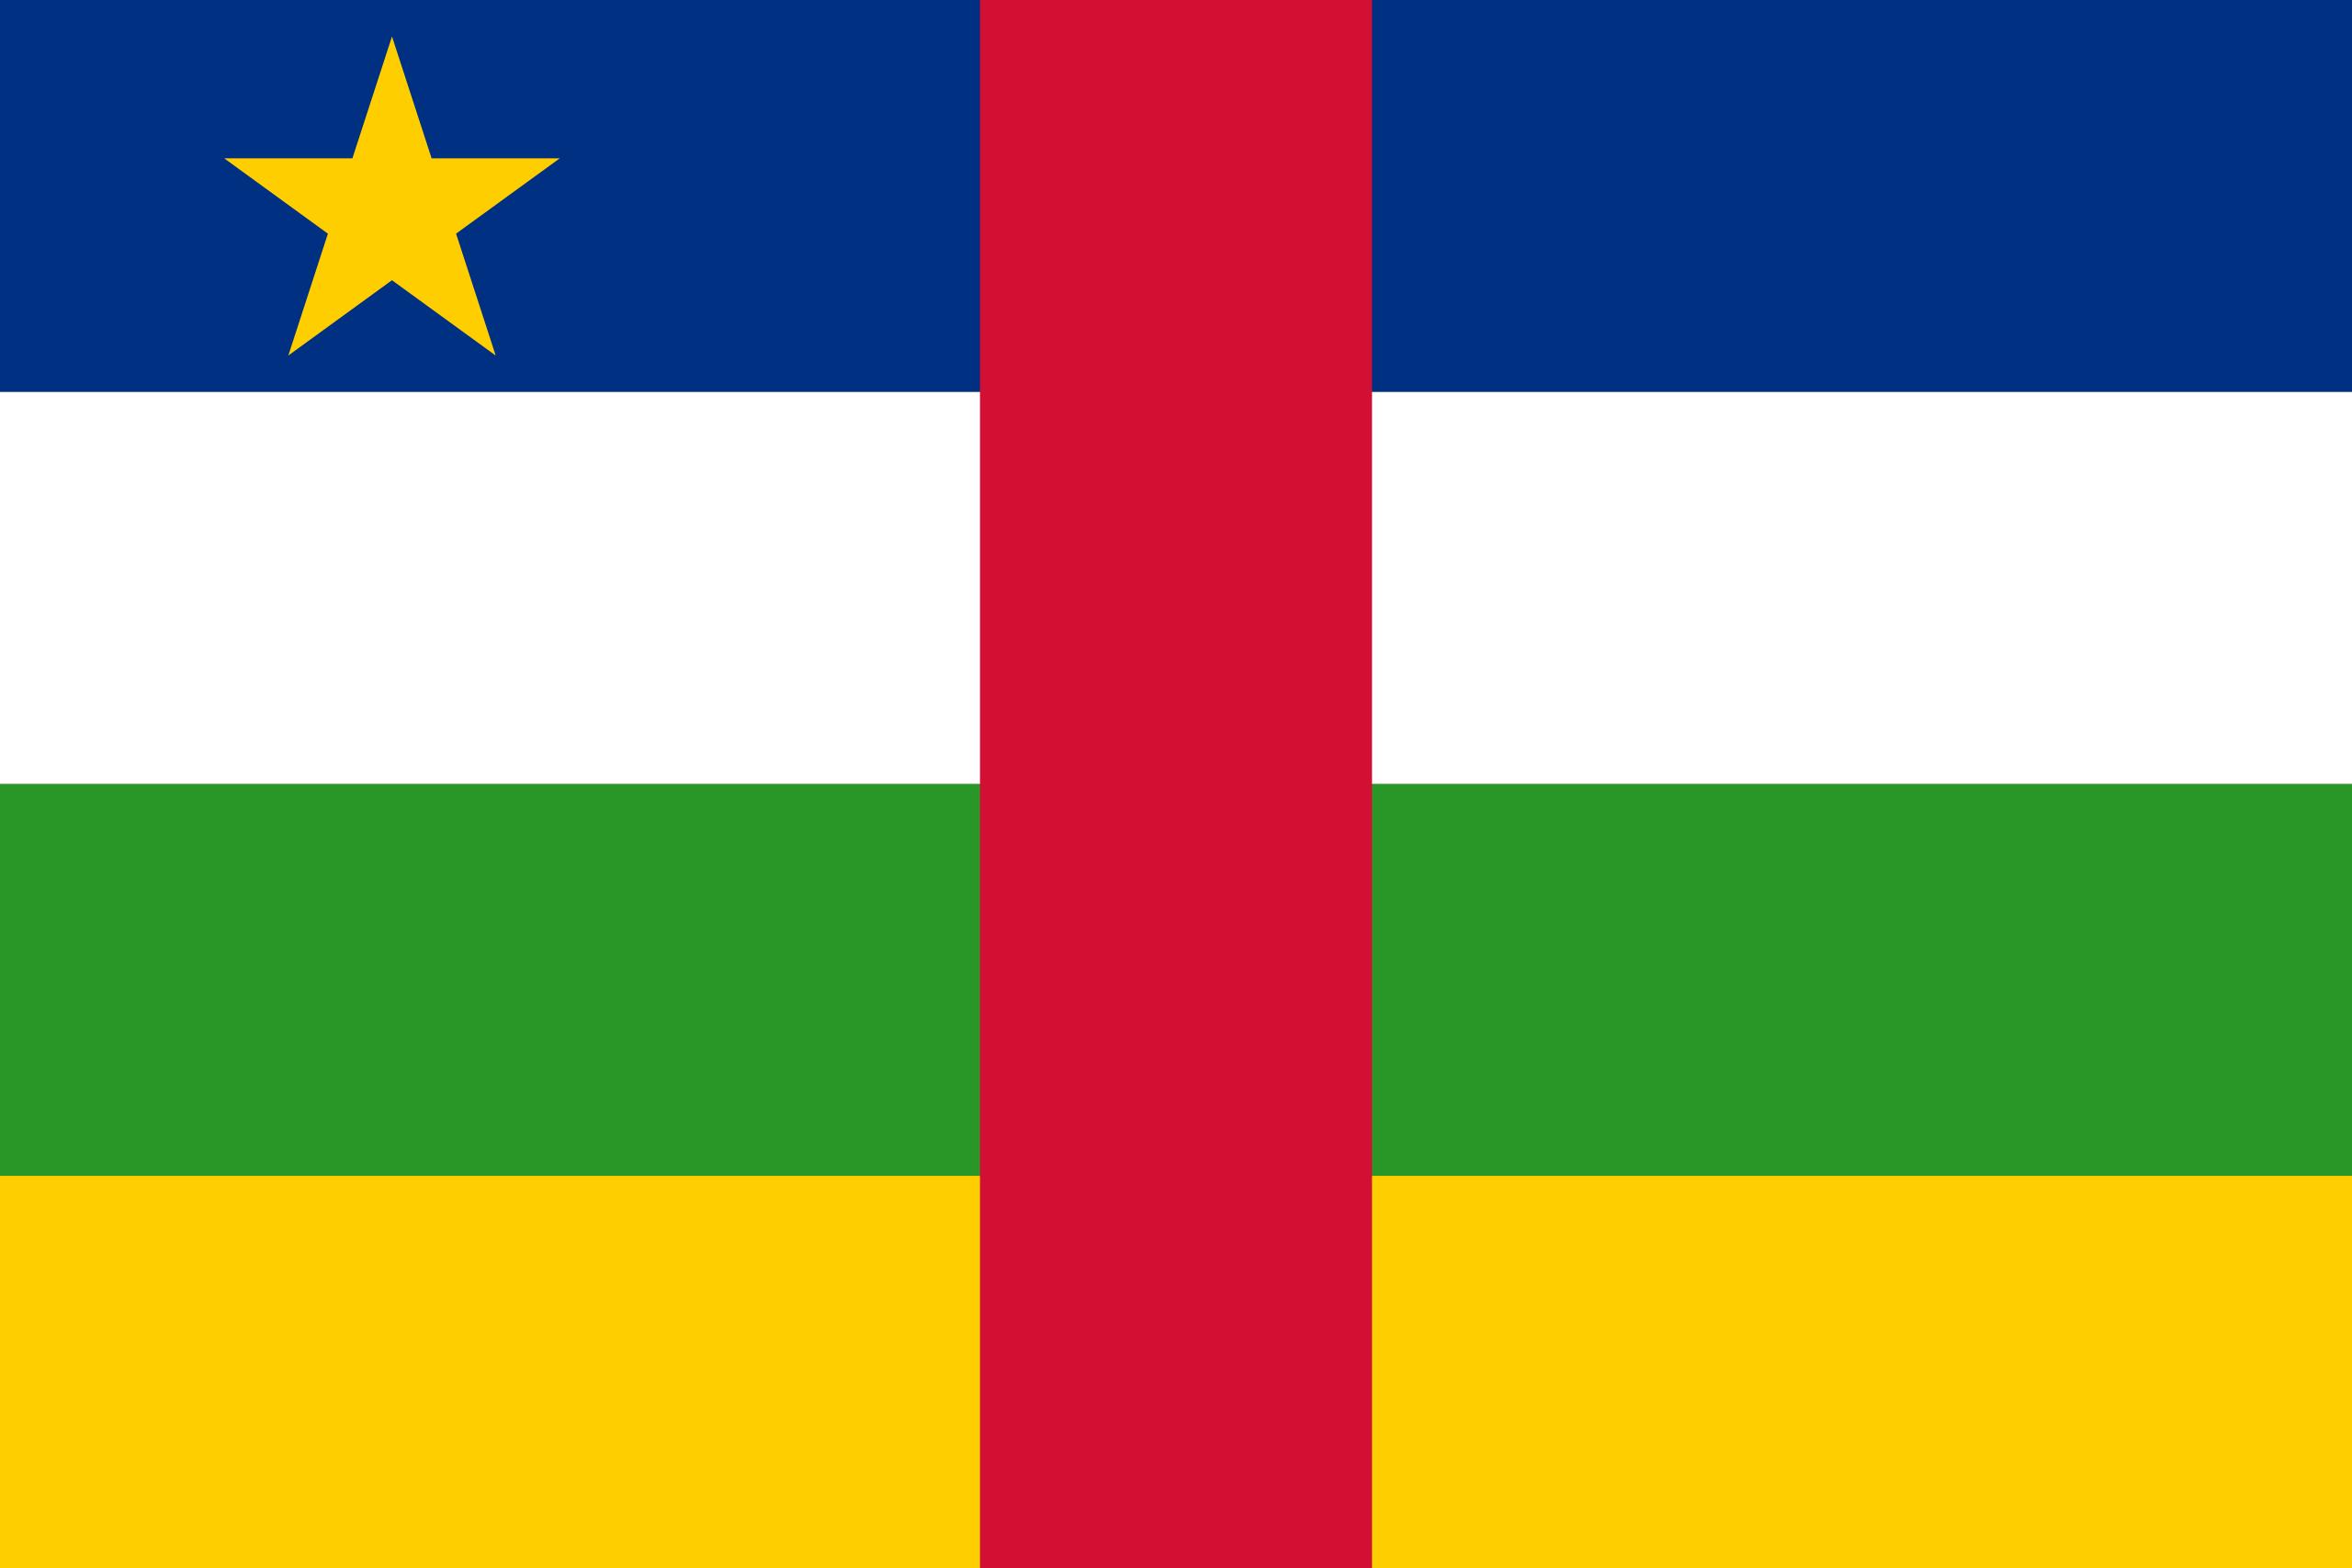 república centroafricana, país, emblema, insignia, símbolo - Fondos de Pantalla HD - professor-falken.com